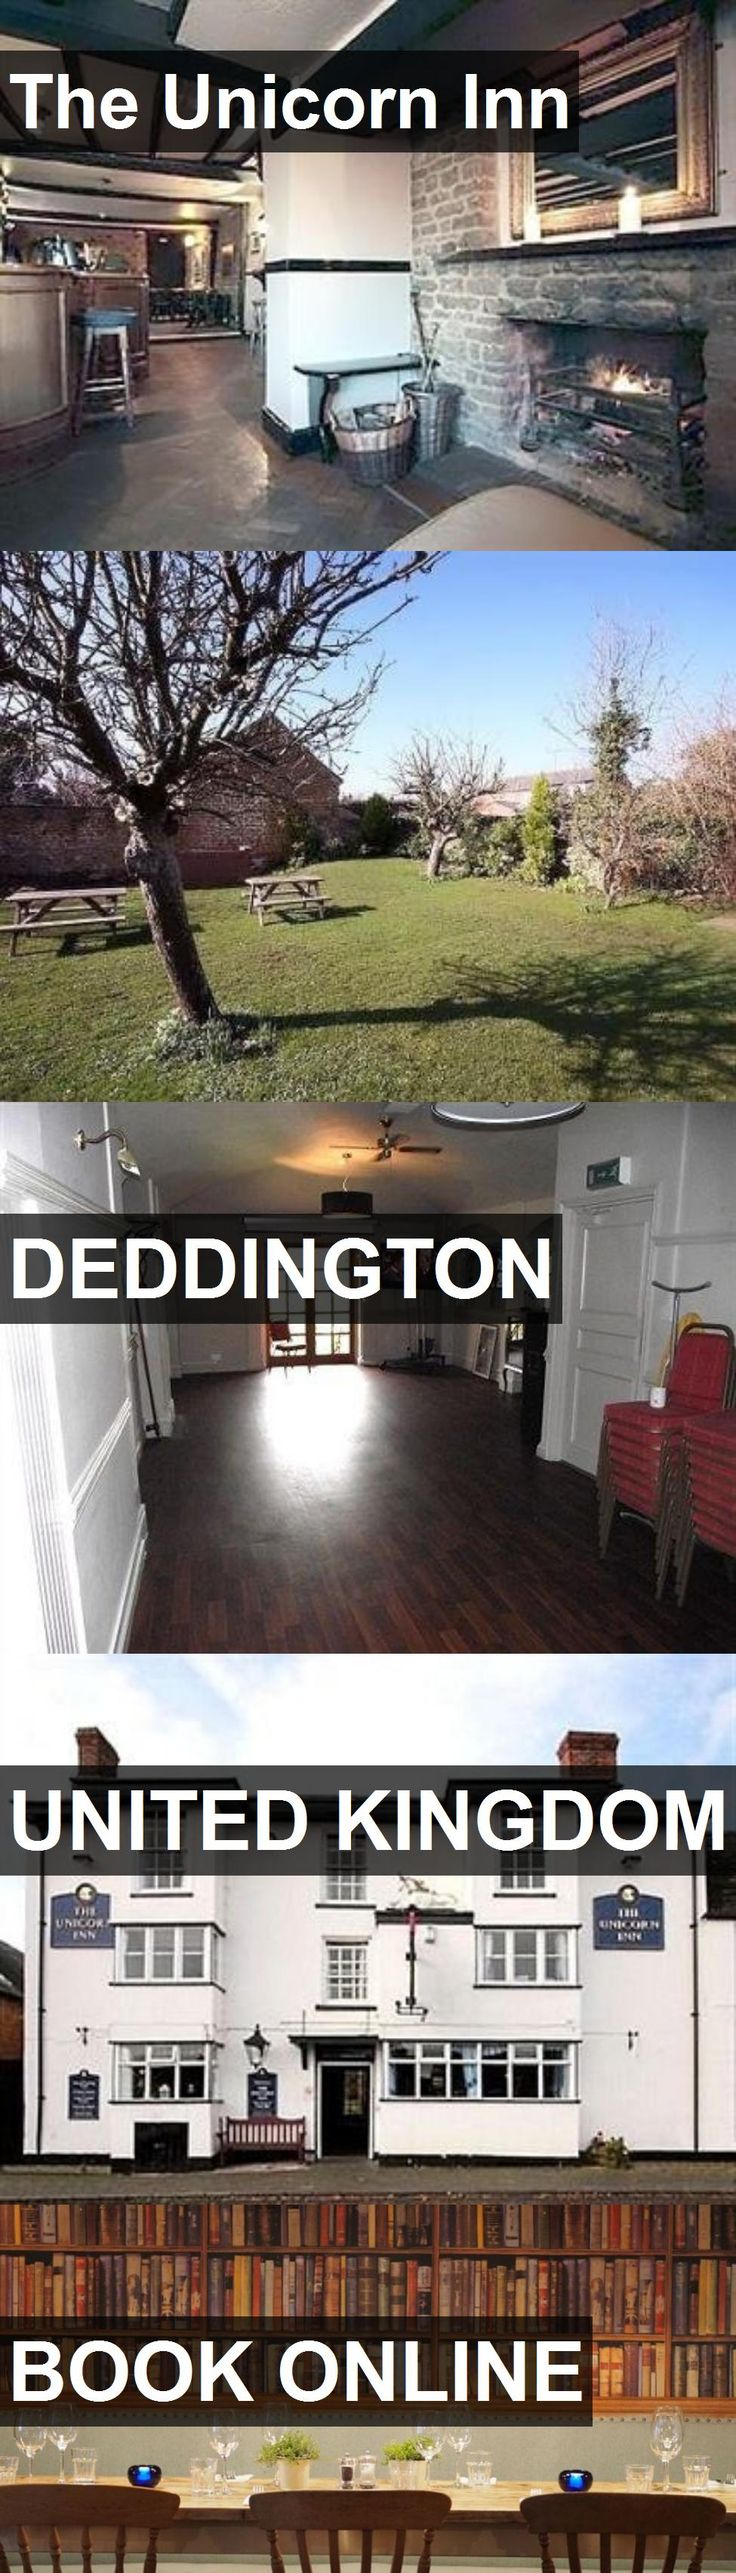 Hotel The Unicorn Inn in Deddington, United Kingdom. For more information, photos, reviews and best prices please follow the link. #UnitedKingdom #Deddington #travel #vacation #hotel